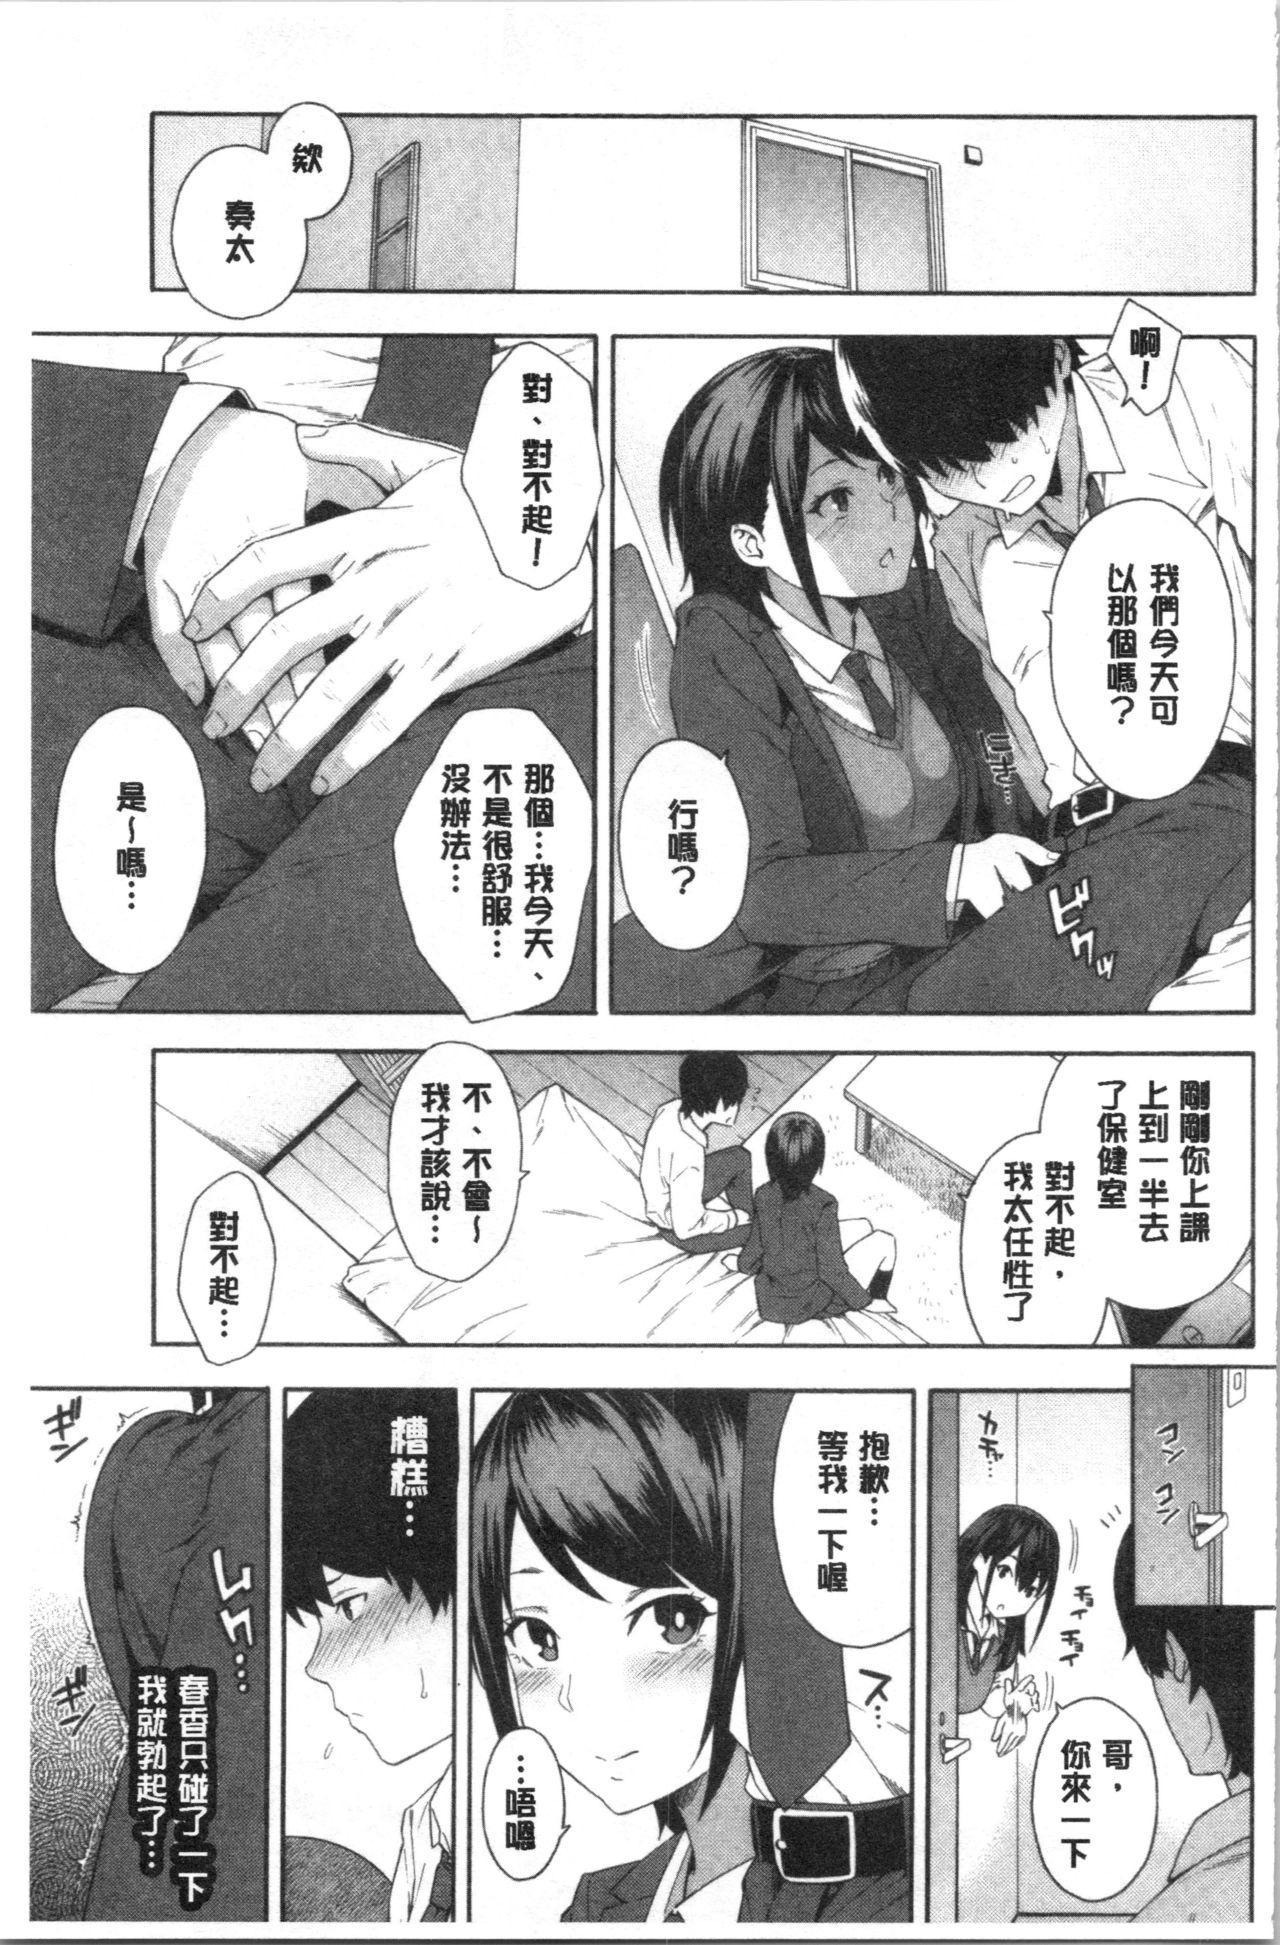 Okashite Ageru | 讓你來侵犯我 103